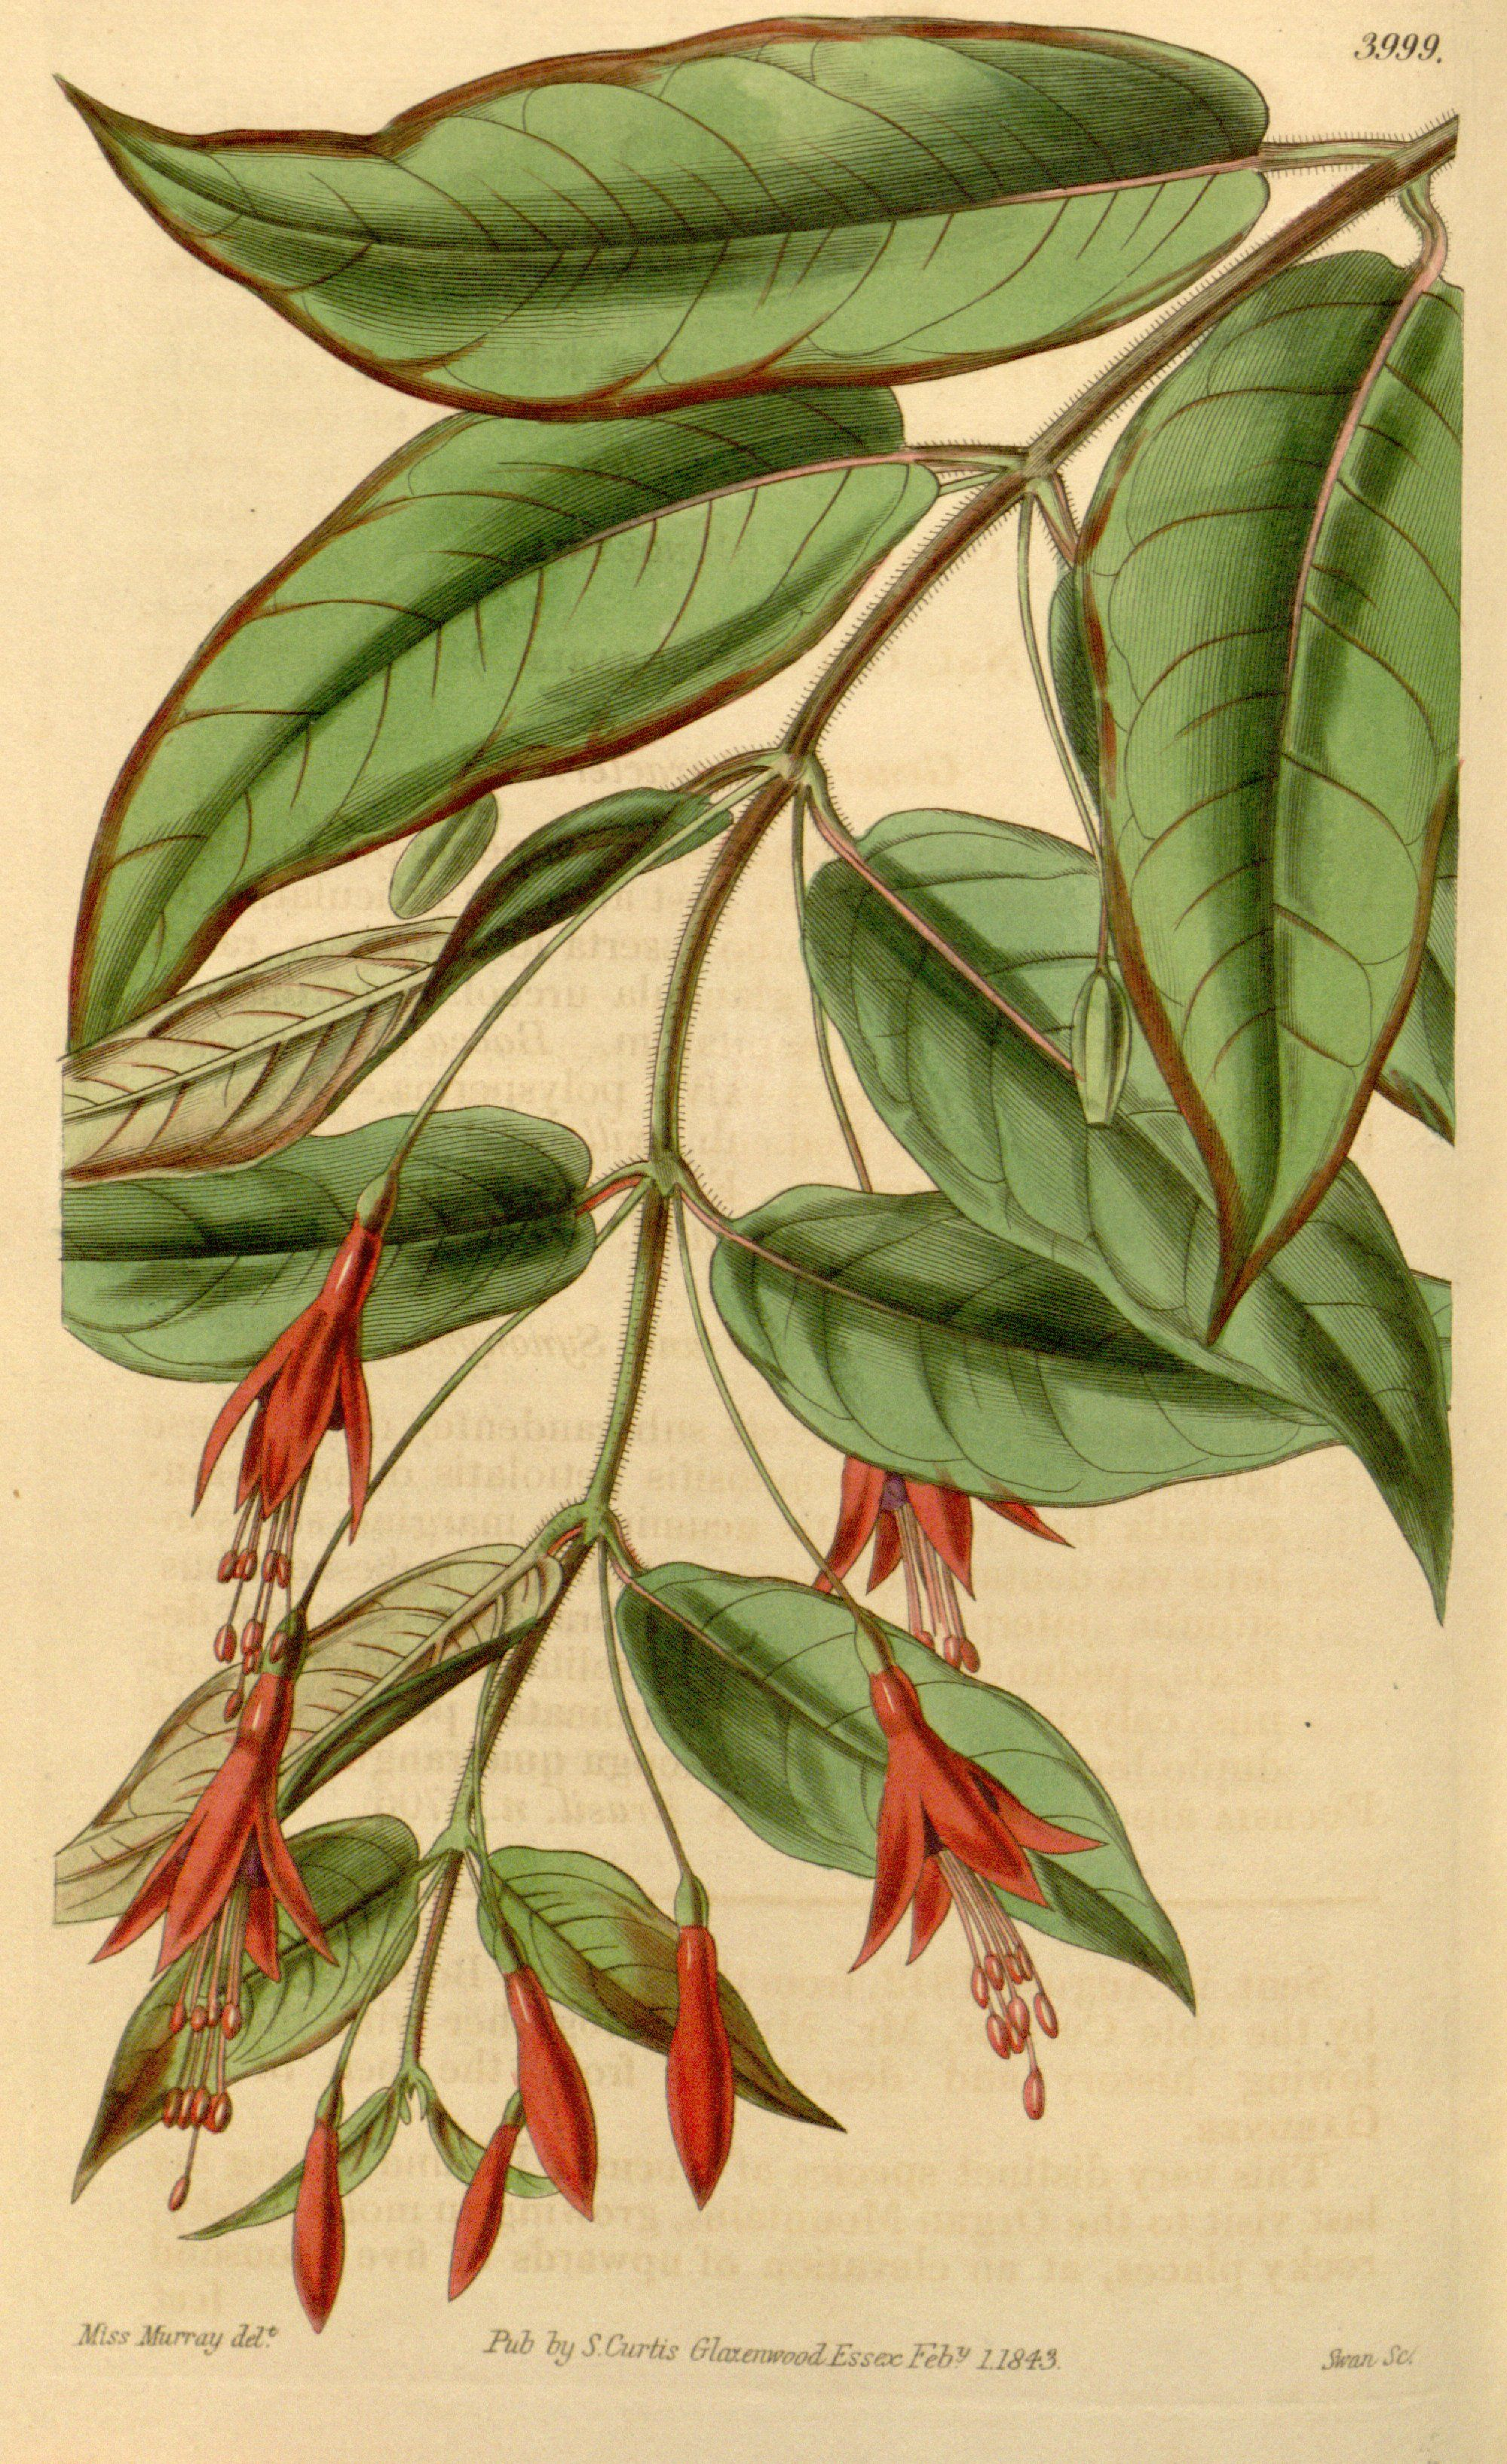 """Fuchsia alpestris Gardner"" by Miss Amelia Matilda Murray (1795 - 1884)"